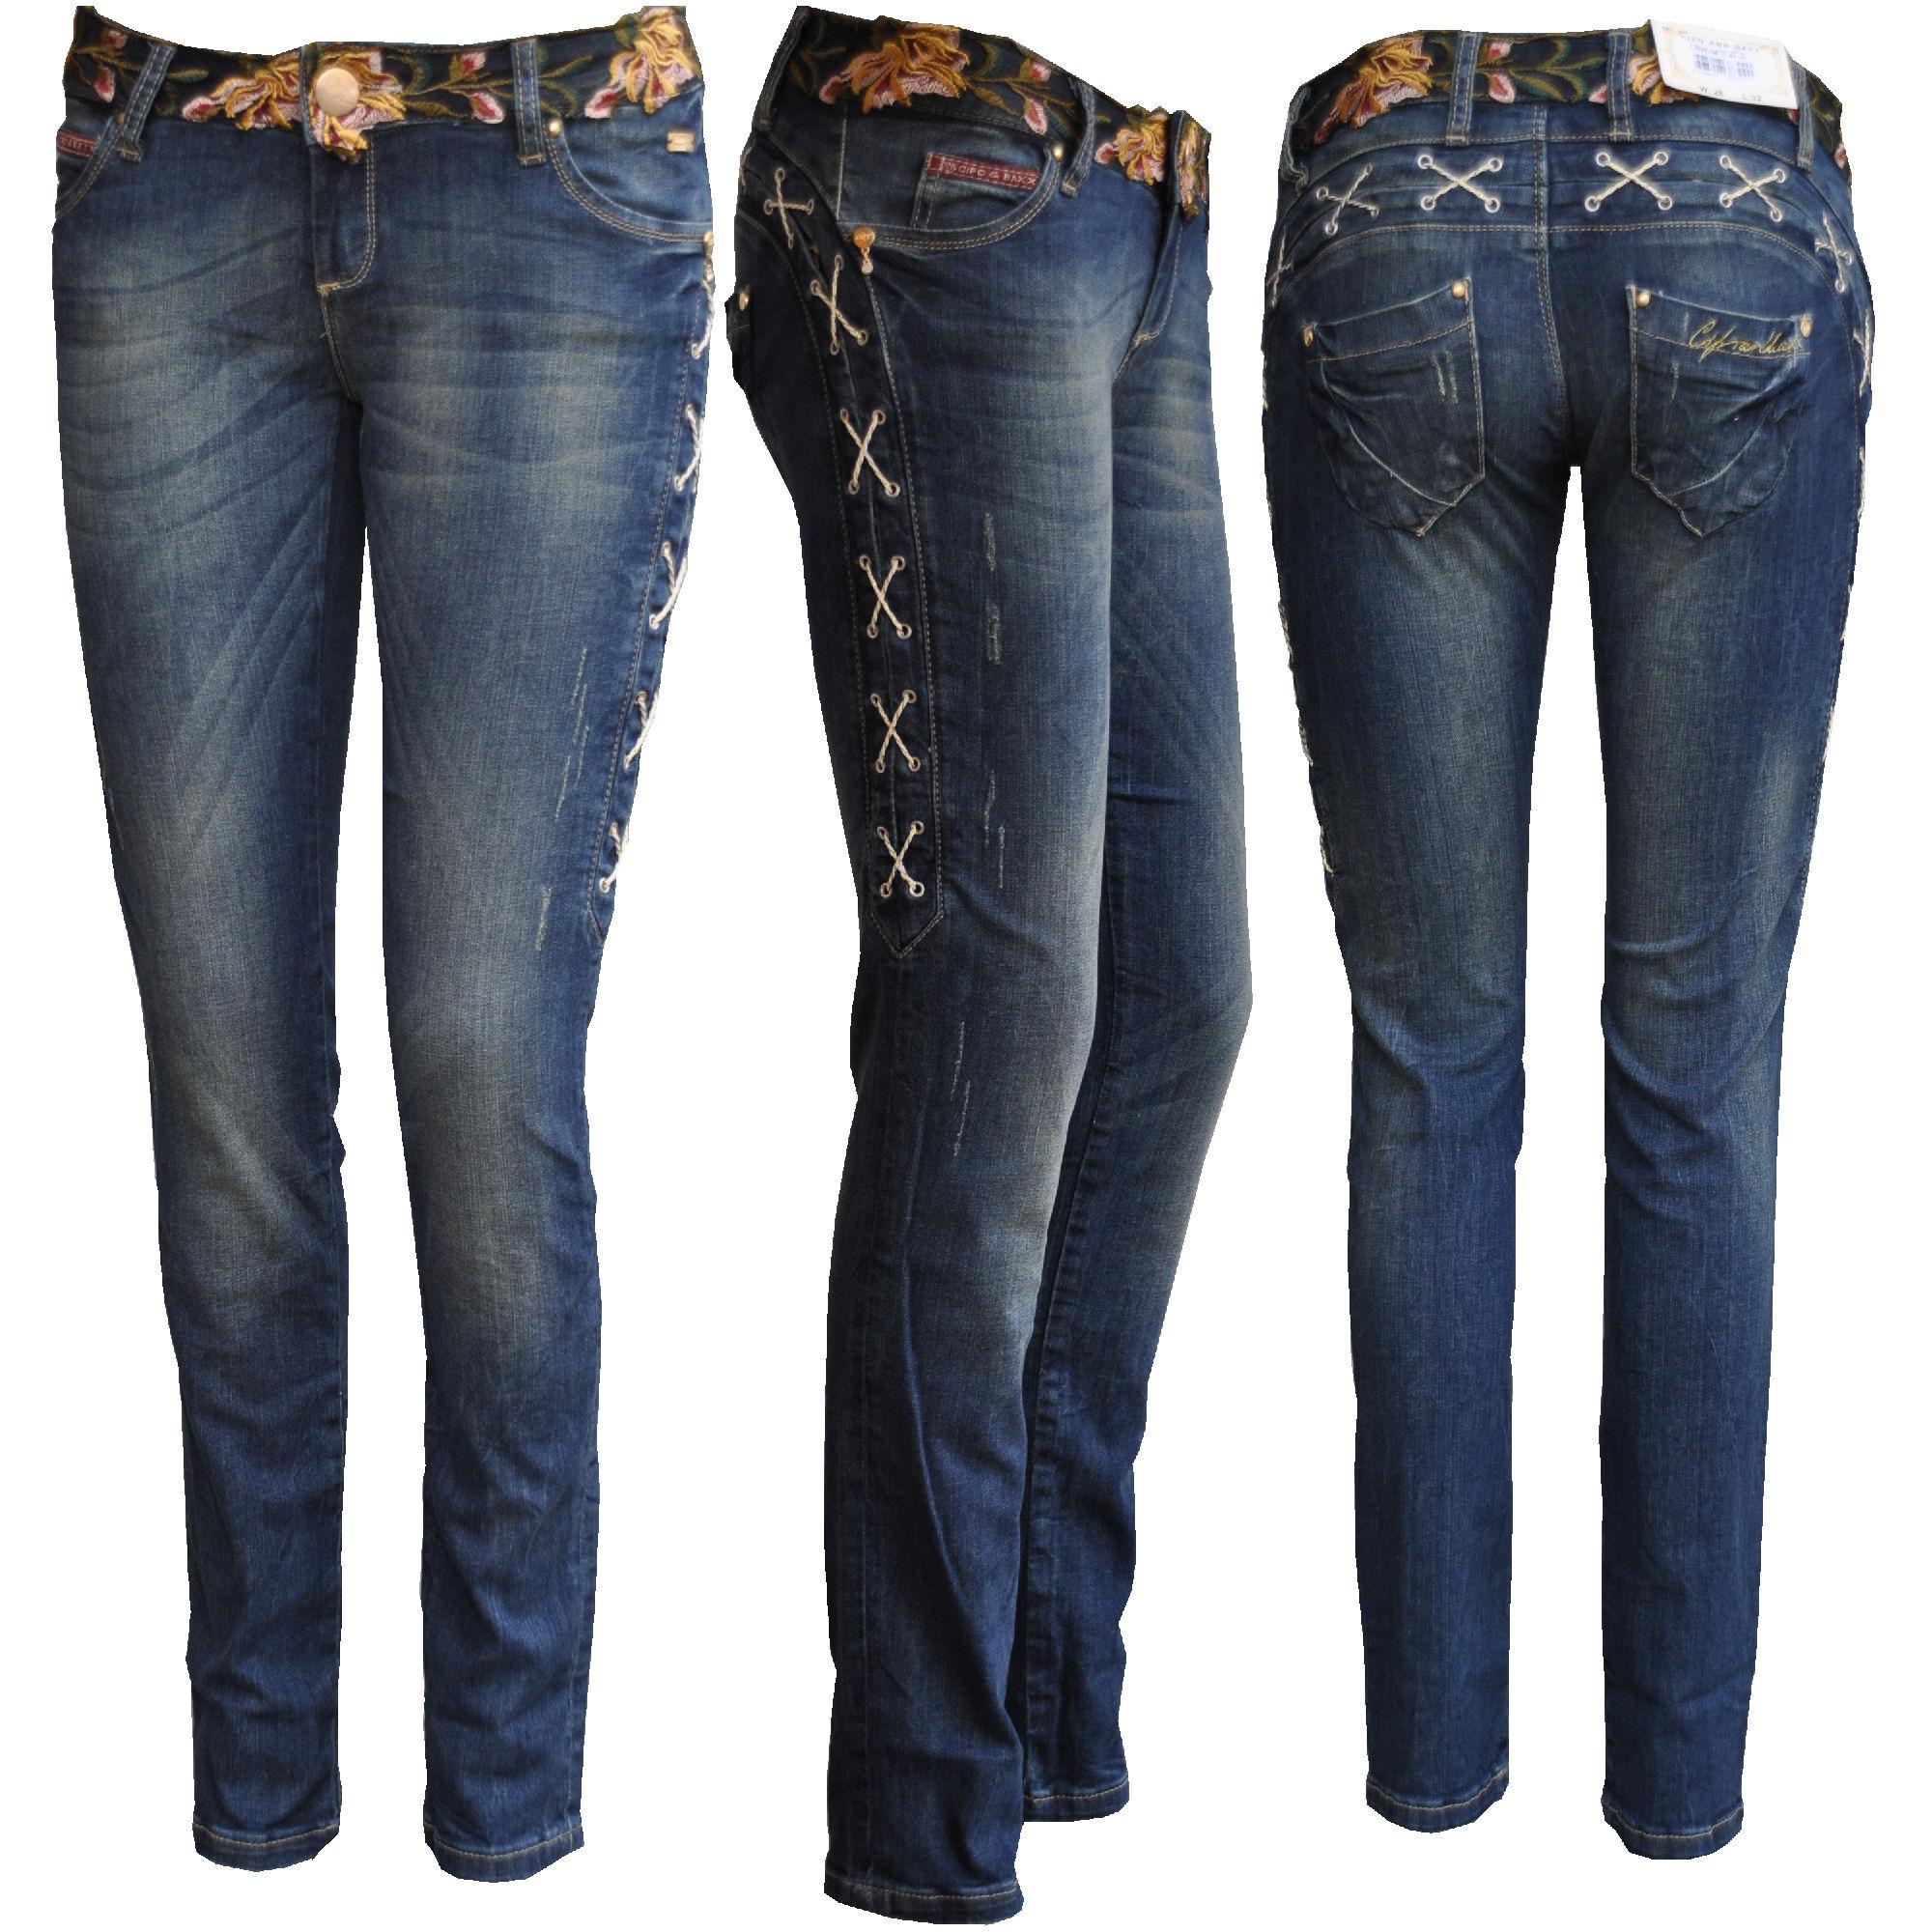 cipo baxx damen jeans hose blau mit stick cbw470 neu ebay. Black Bedroom Furniture Sets. Home Design Ideas